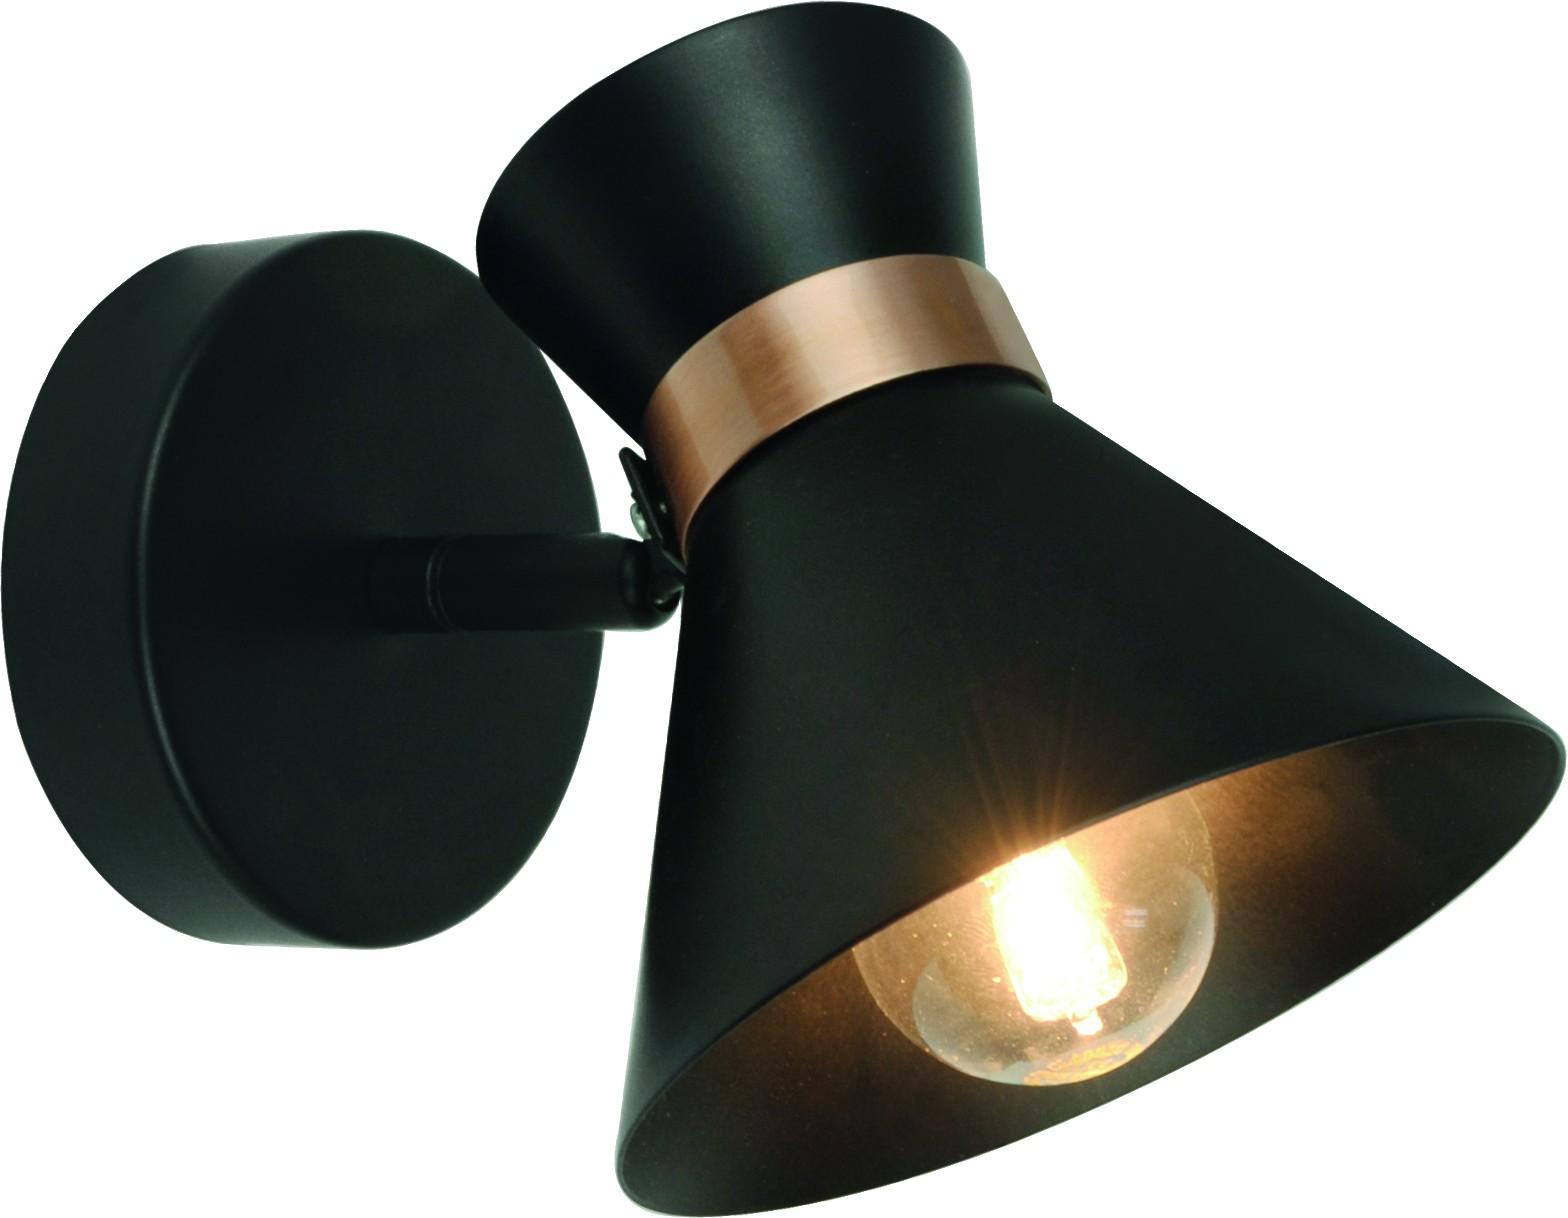 Спот Arte lamp A1406ap-1bk от 220 Вольт